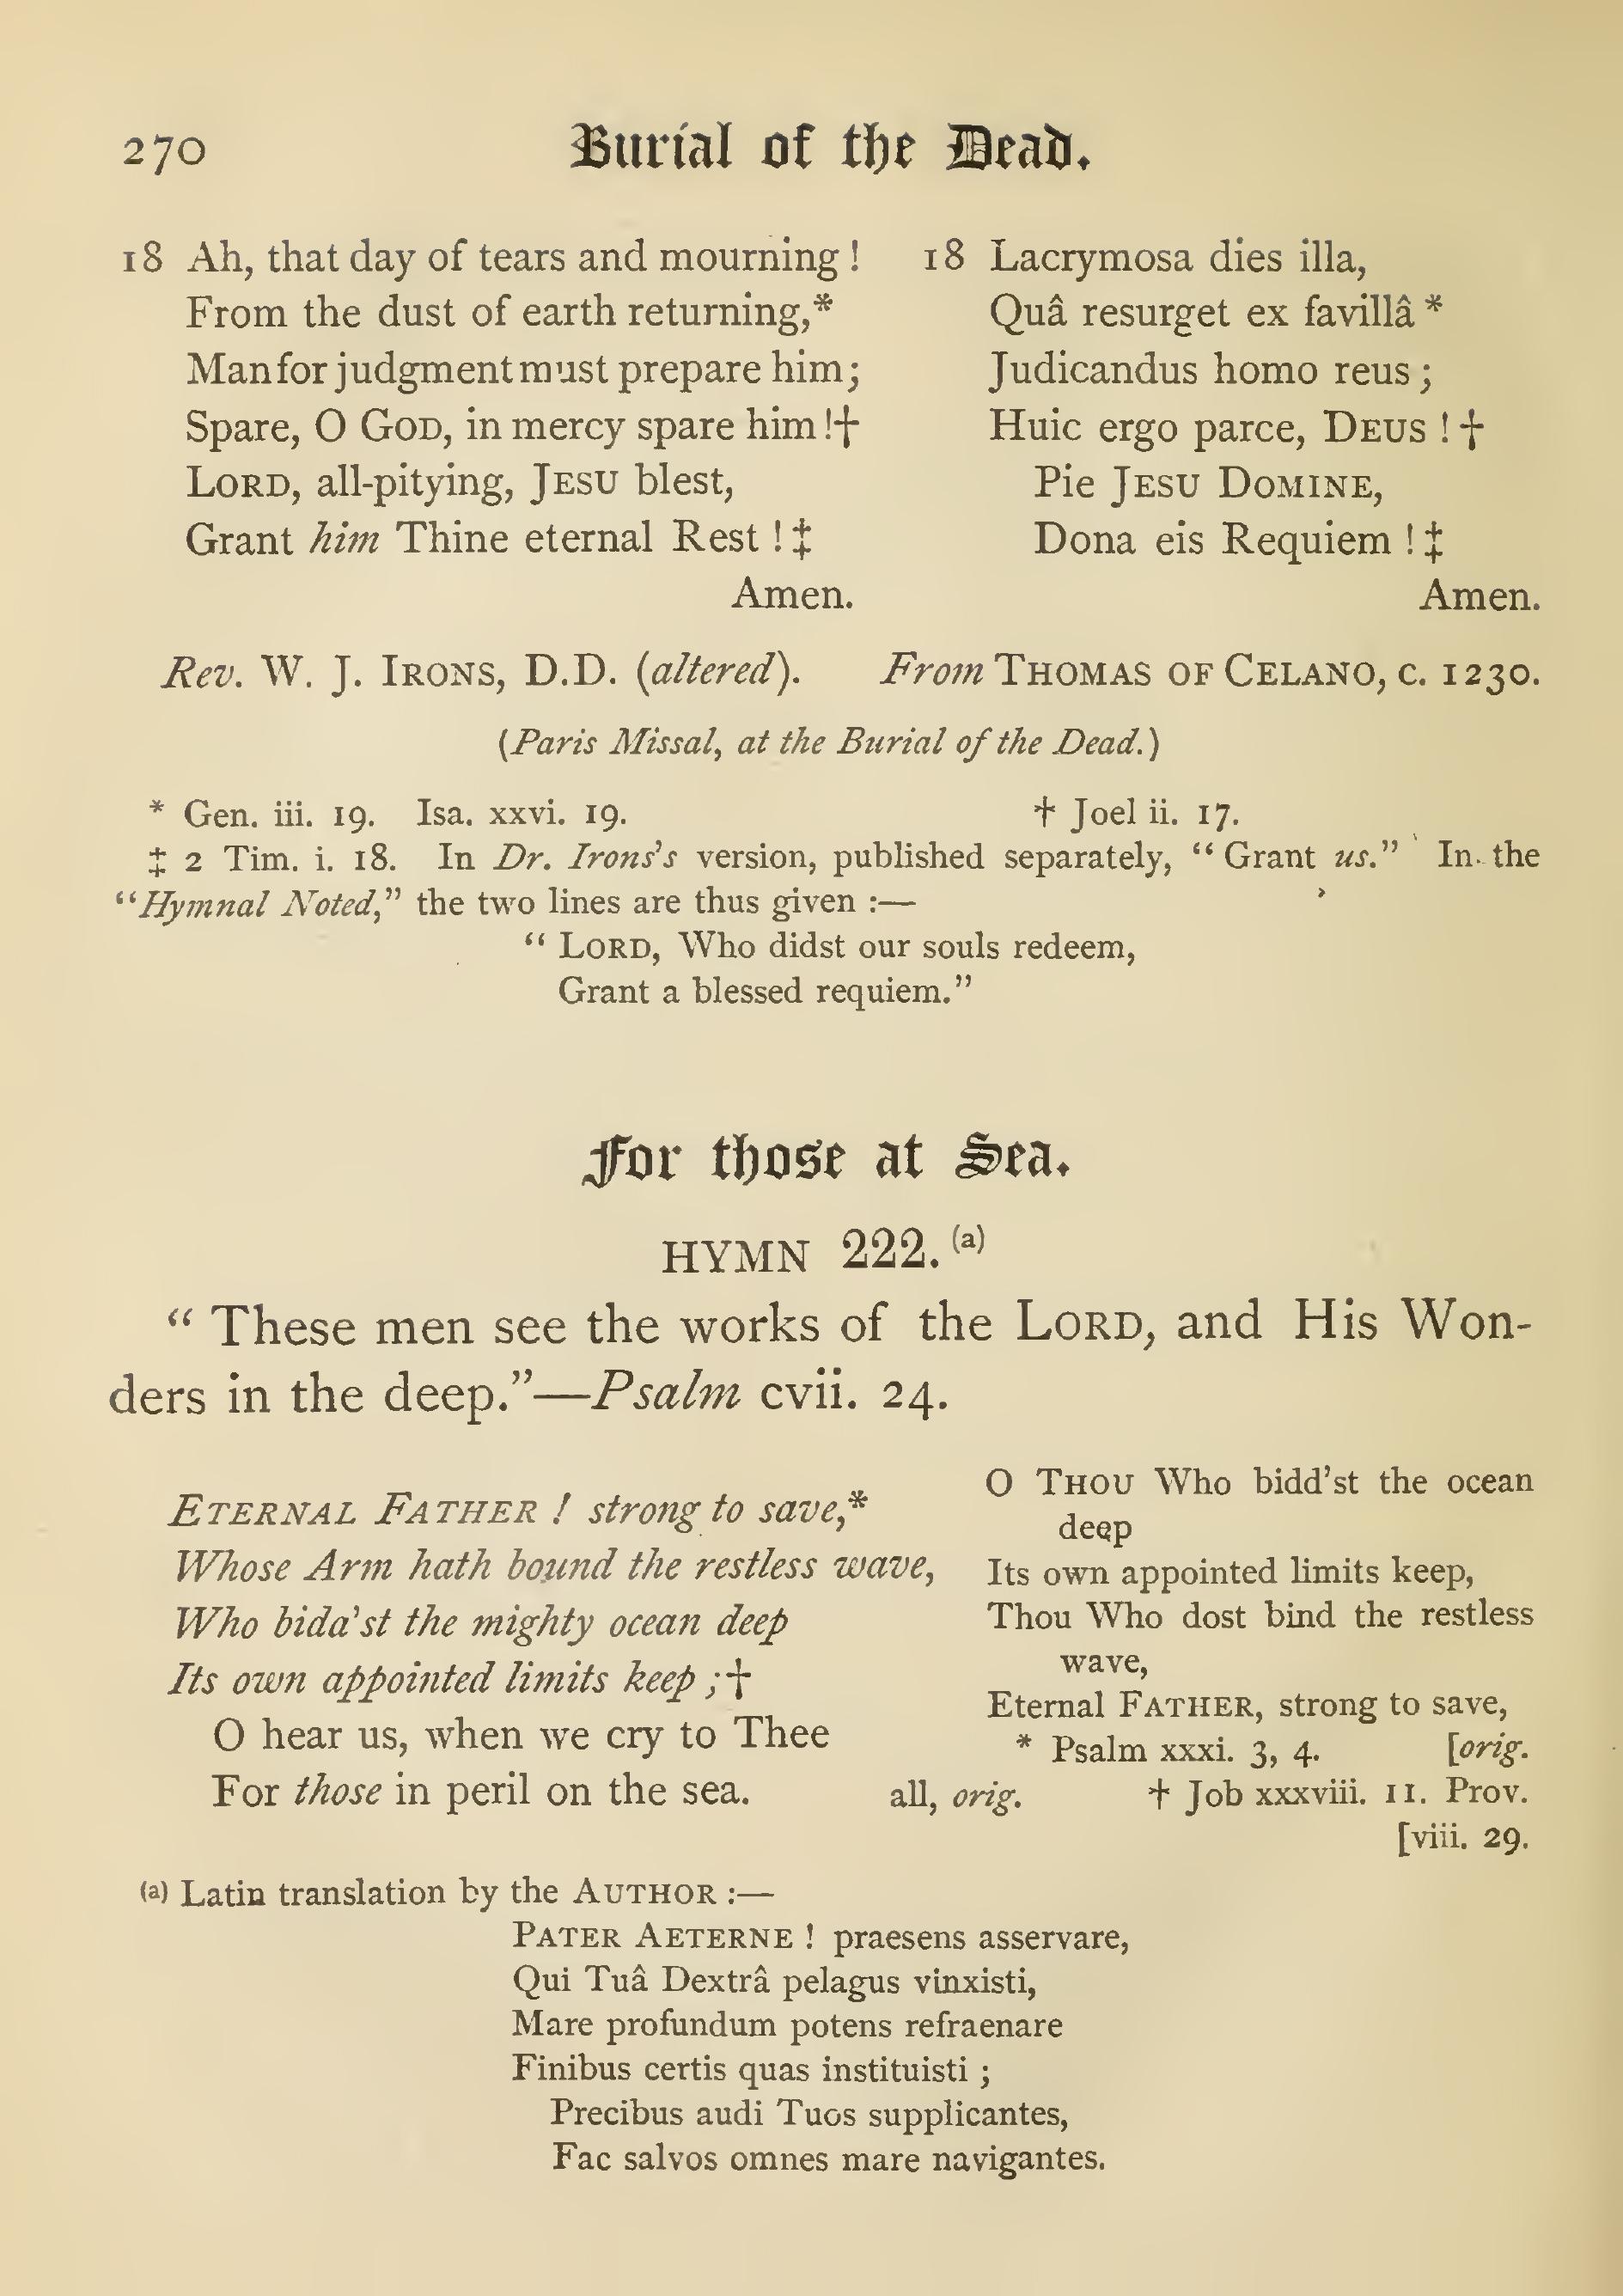 HymnsAncientModern-Biggs-1867 292.jpg